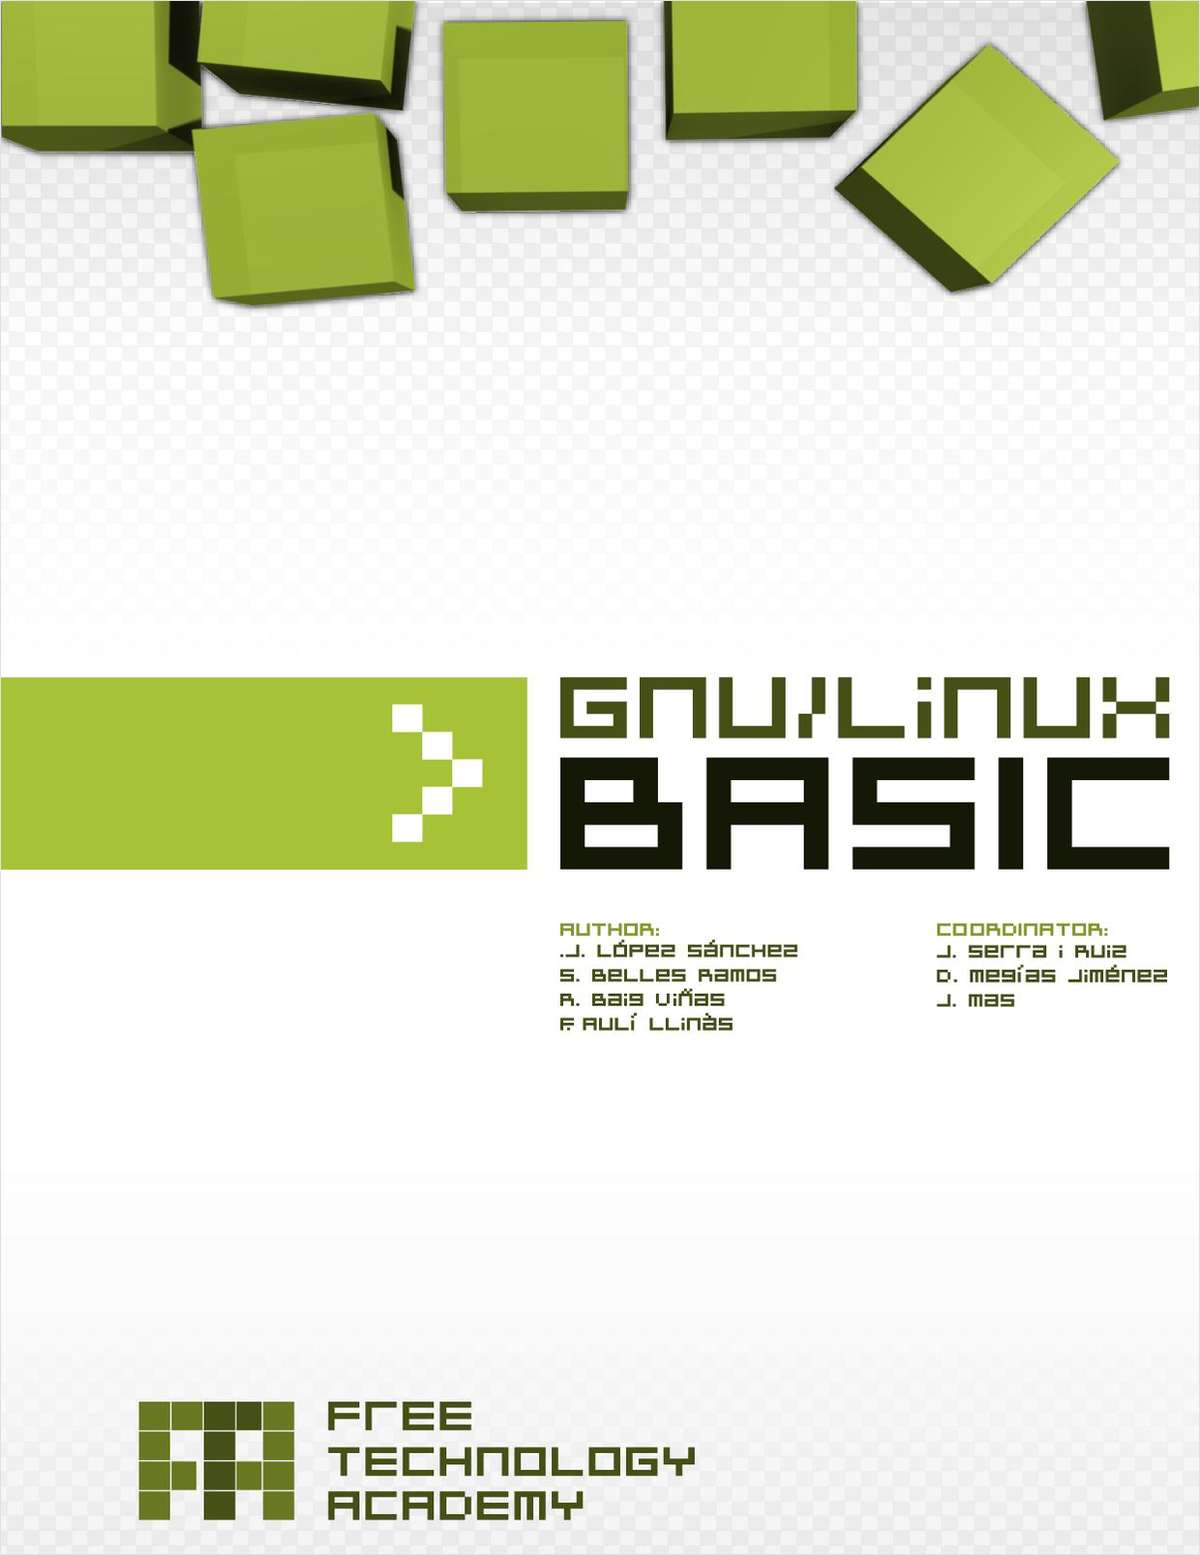 GNU/Linux Basic